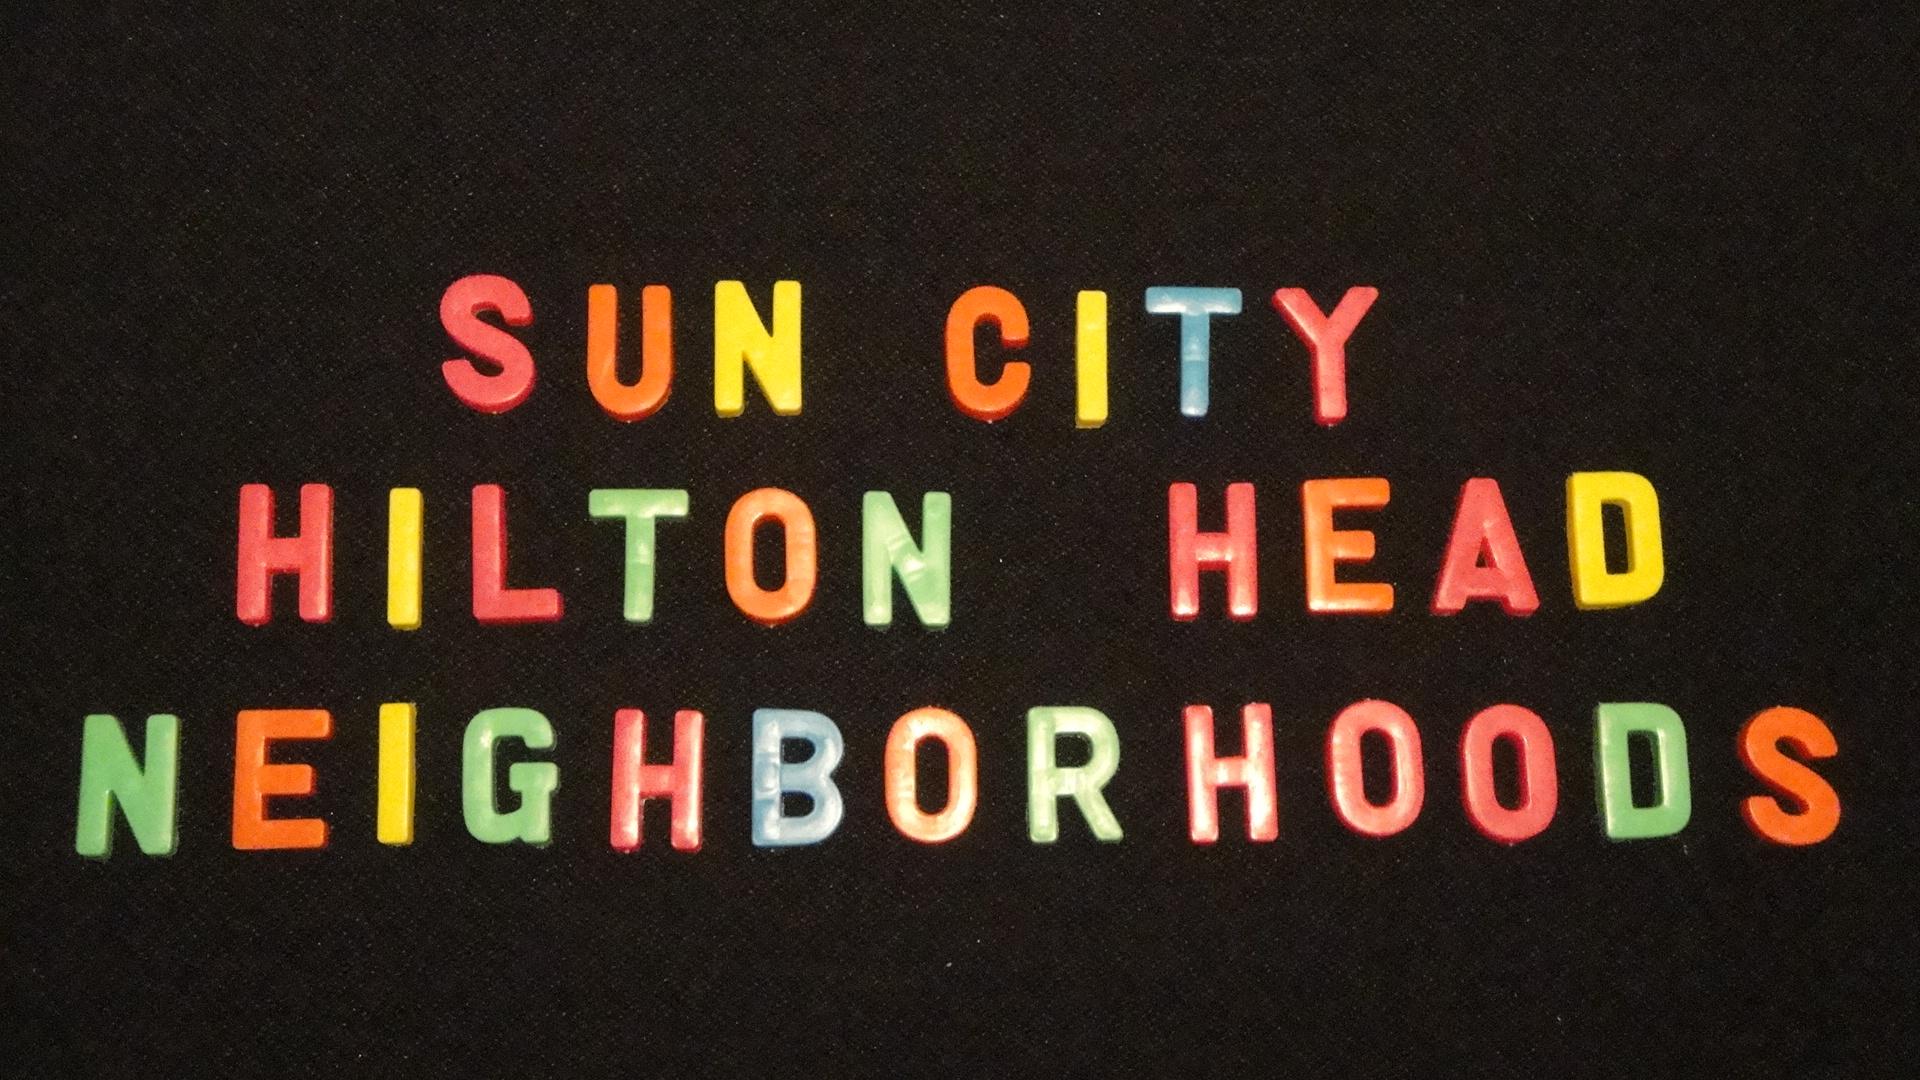 sun city hilton head neighborhoods, legal addresses